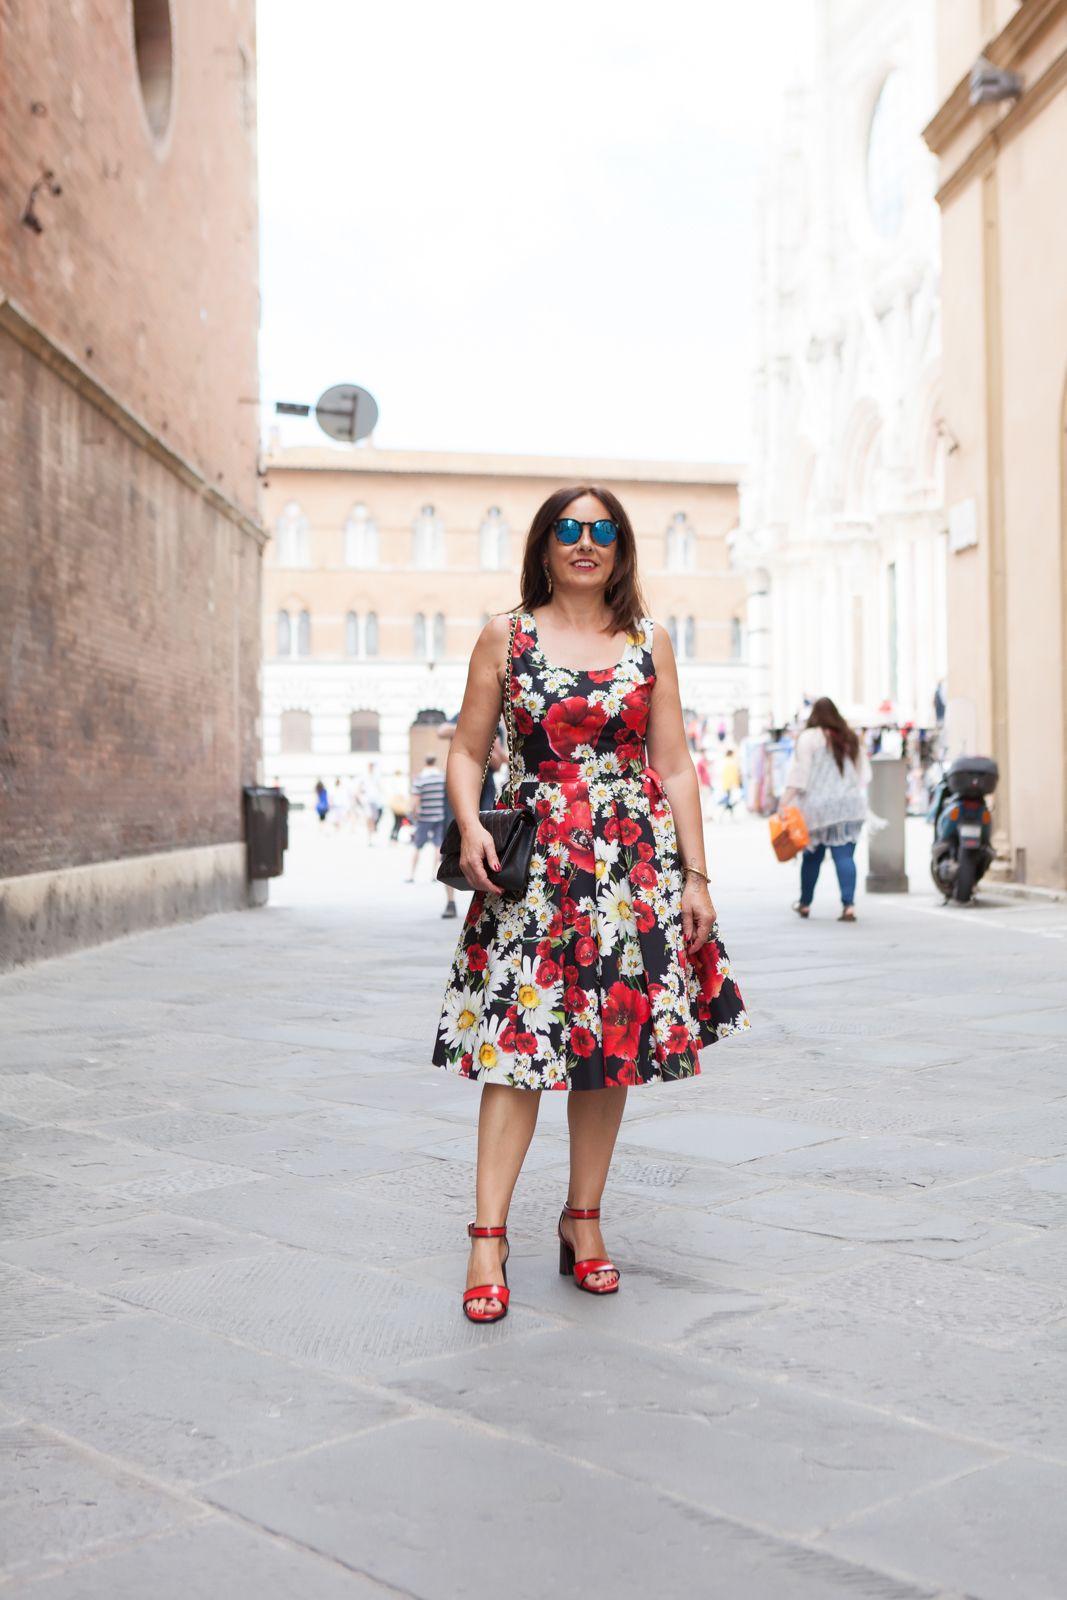 My dress is a flower garden - illesteva sunglasses, dolce gabbana flower dress, amle earrings, marine sandals. photo shooting in Siena - Not Only Twenty Fashion blog